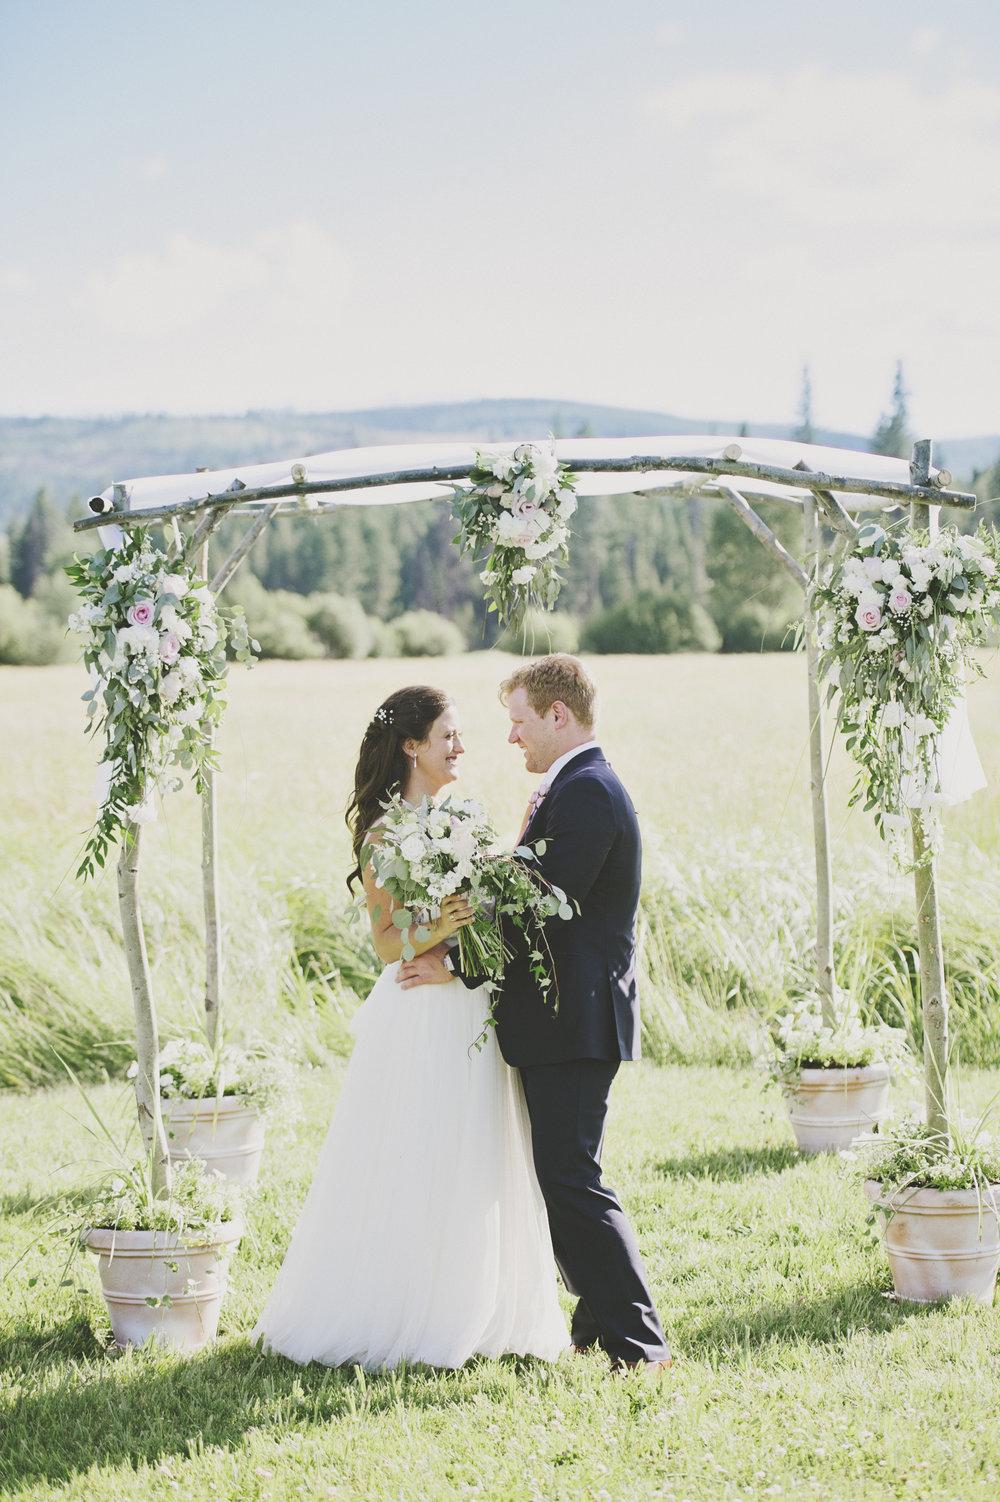 Chloe Hurwitz + Kiefer Martin Wedding_Grey Wolf Ranch_Kelsey Lane Photography1892-2 copy.jpg